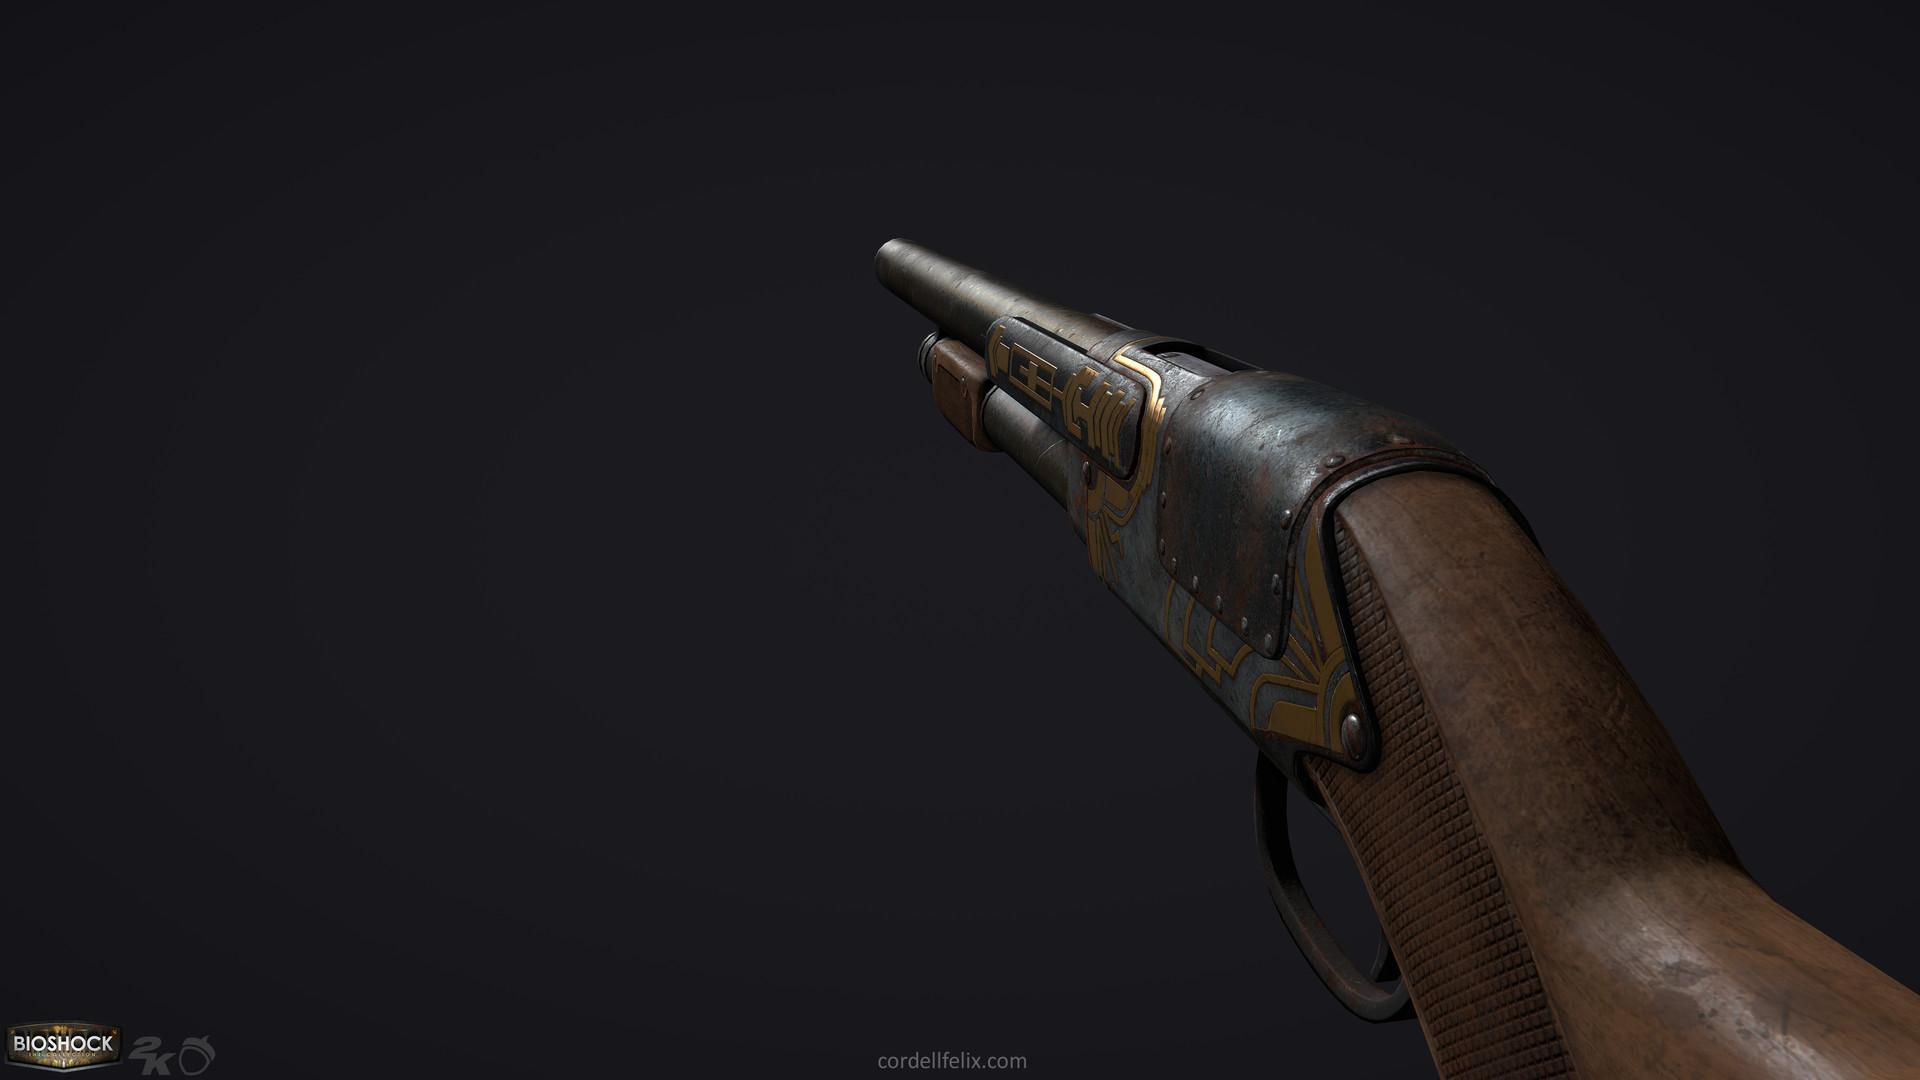 Cordell felix cordellfelix shotgun 02